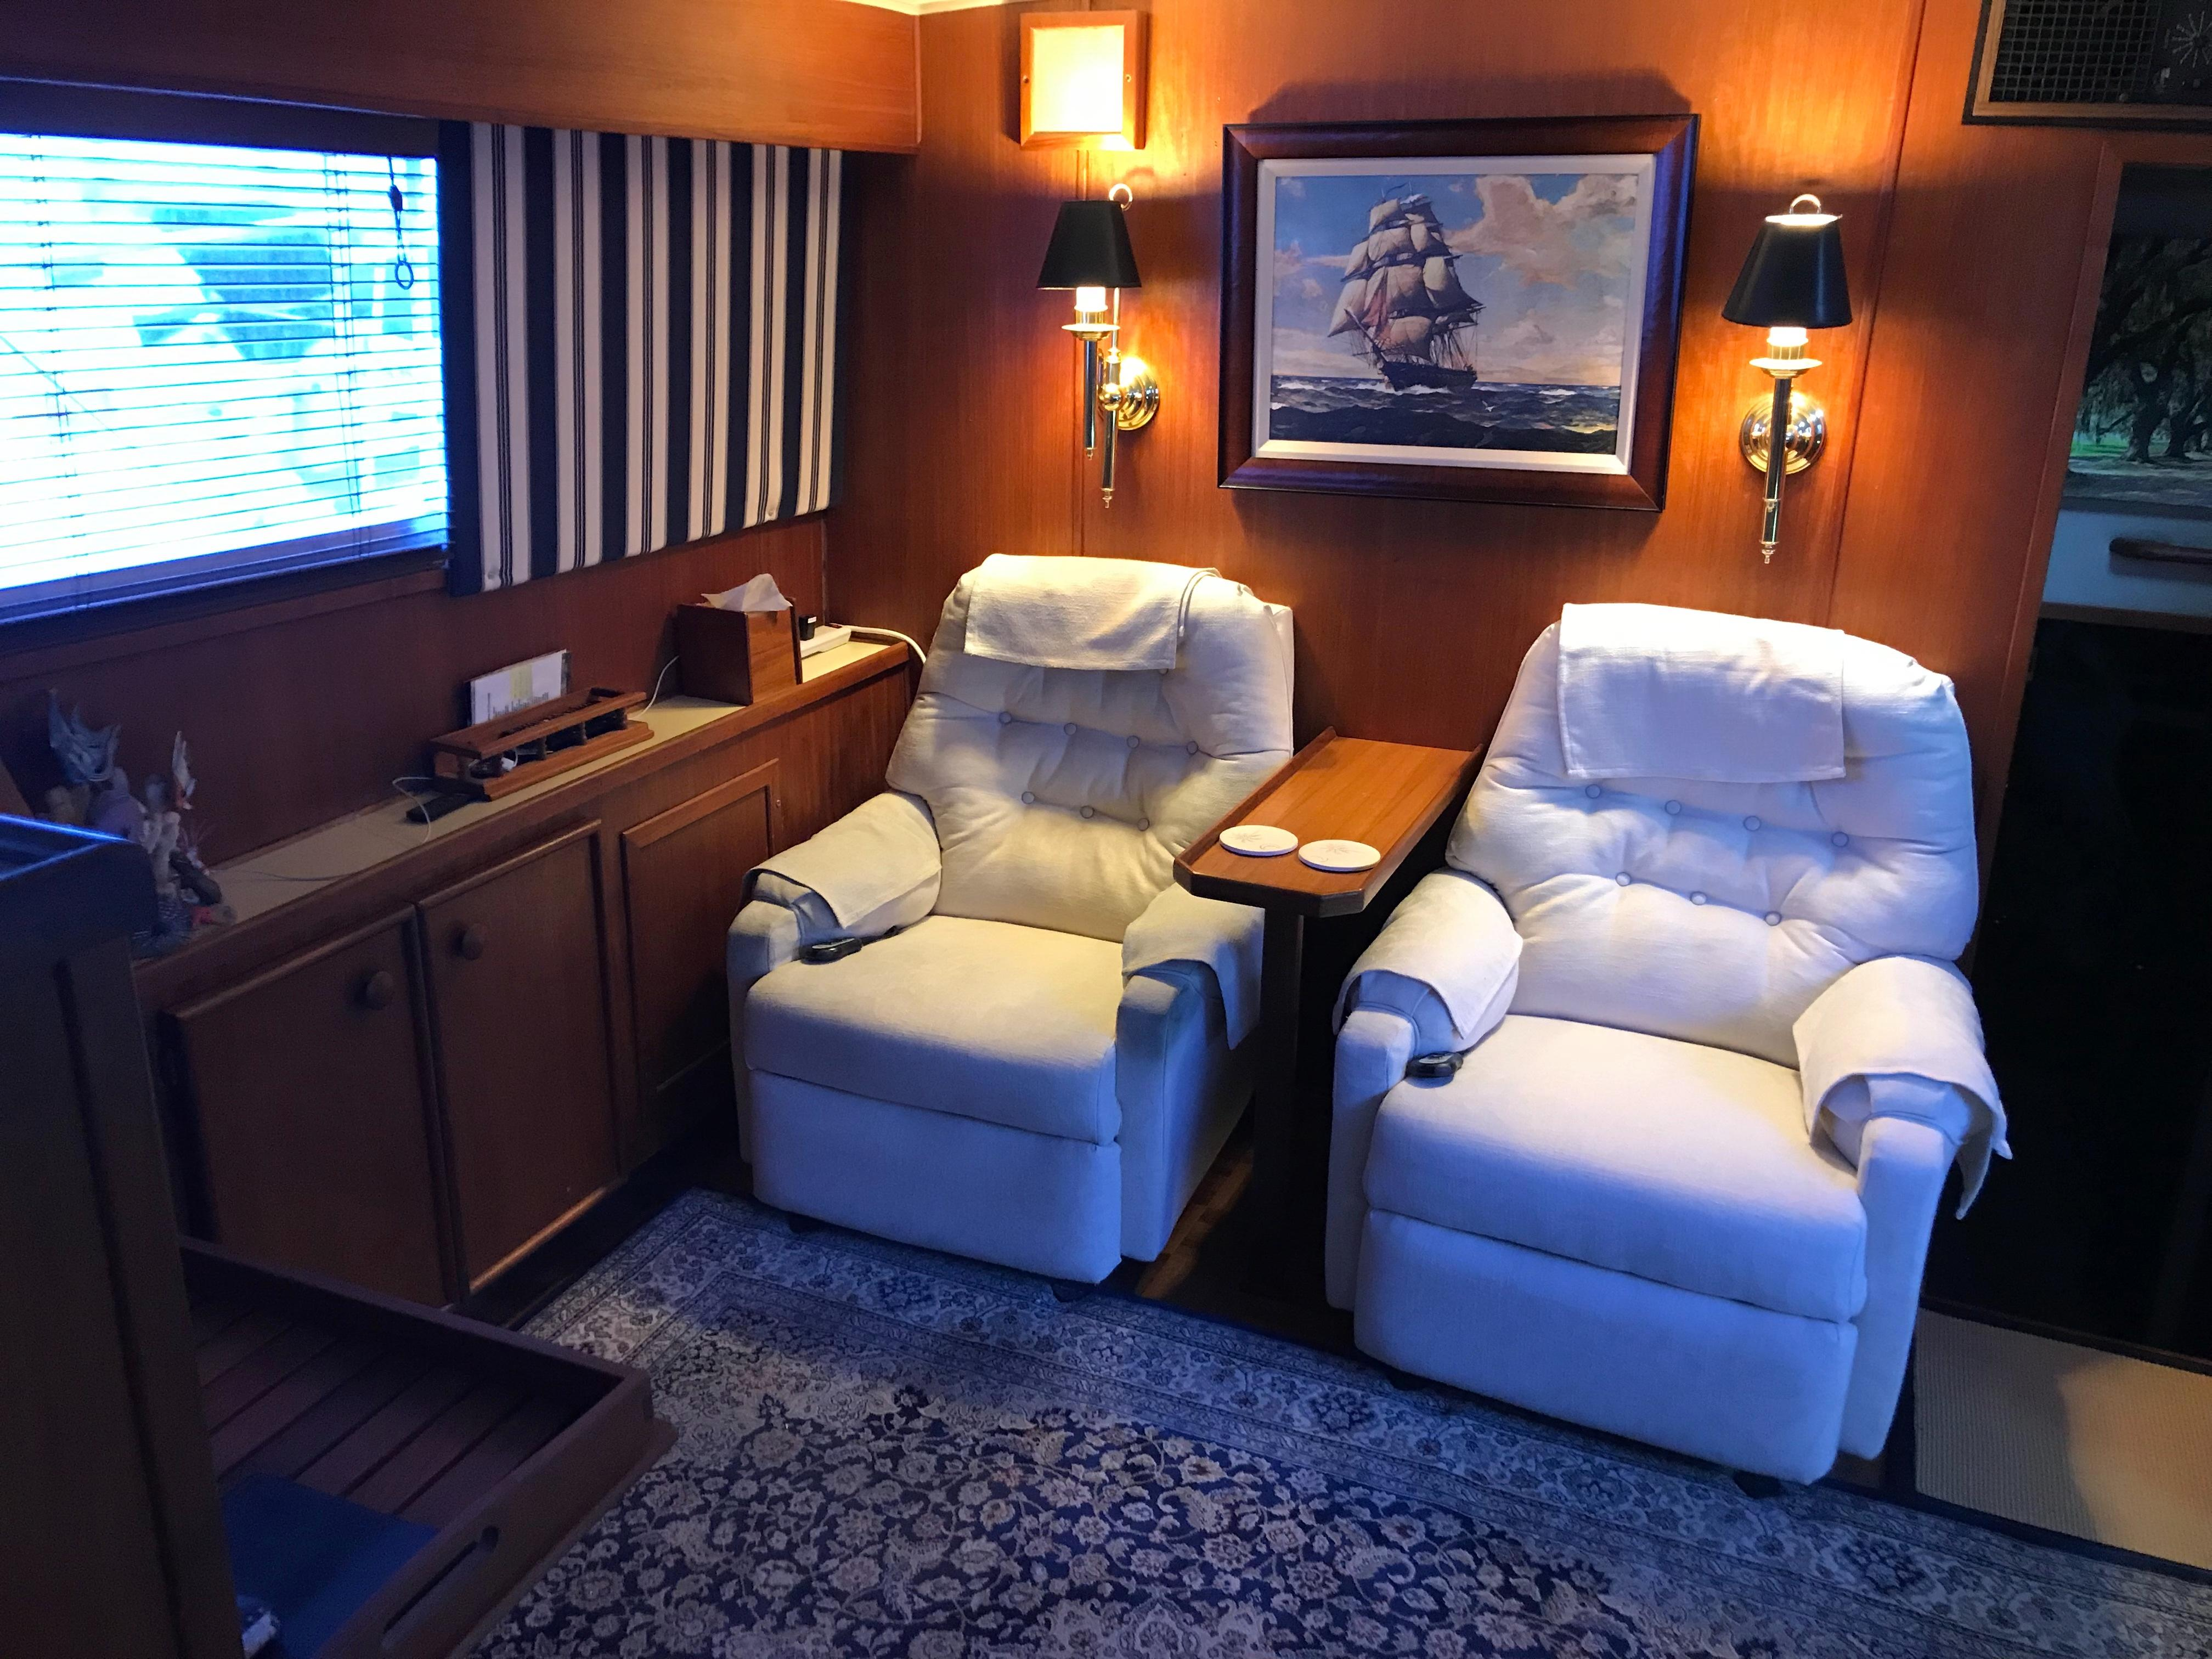 Chris-craft 46 Constellation - Lower Salon Seating